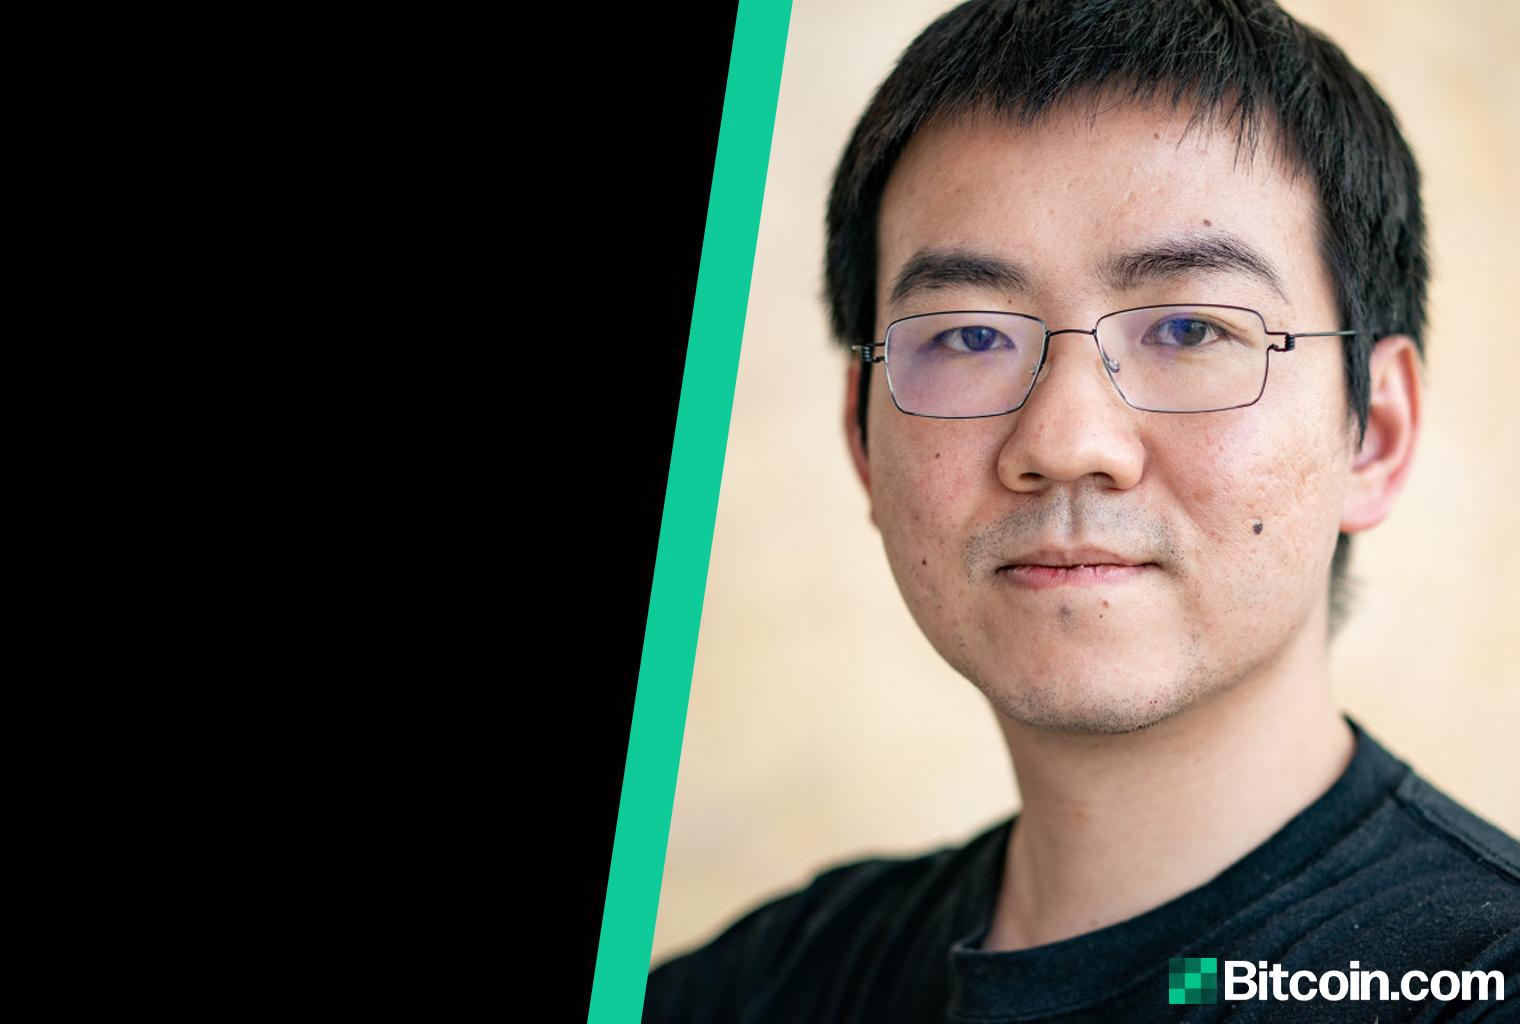 Bitmain's Jihan Wu Talks Mining and Industry Growth With Bitcoin.com's CEO